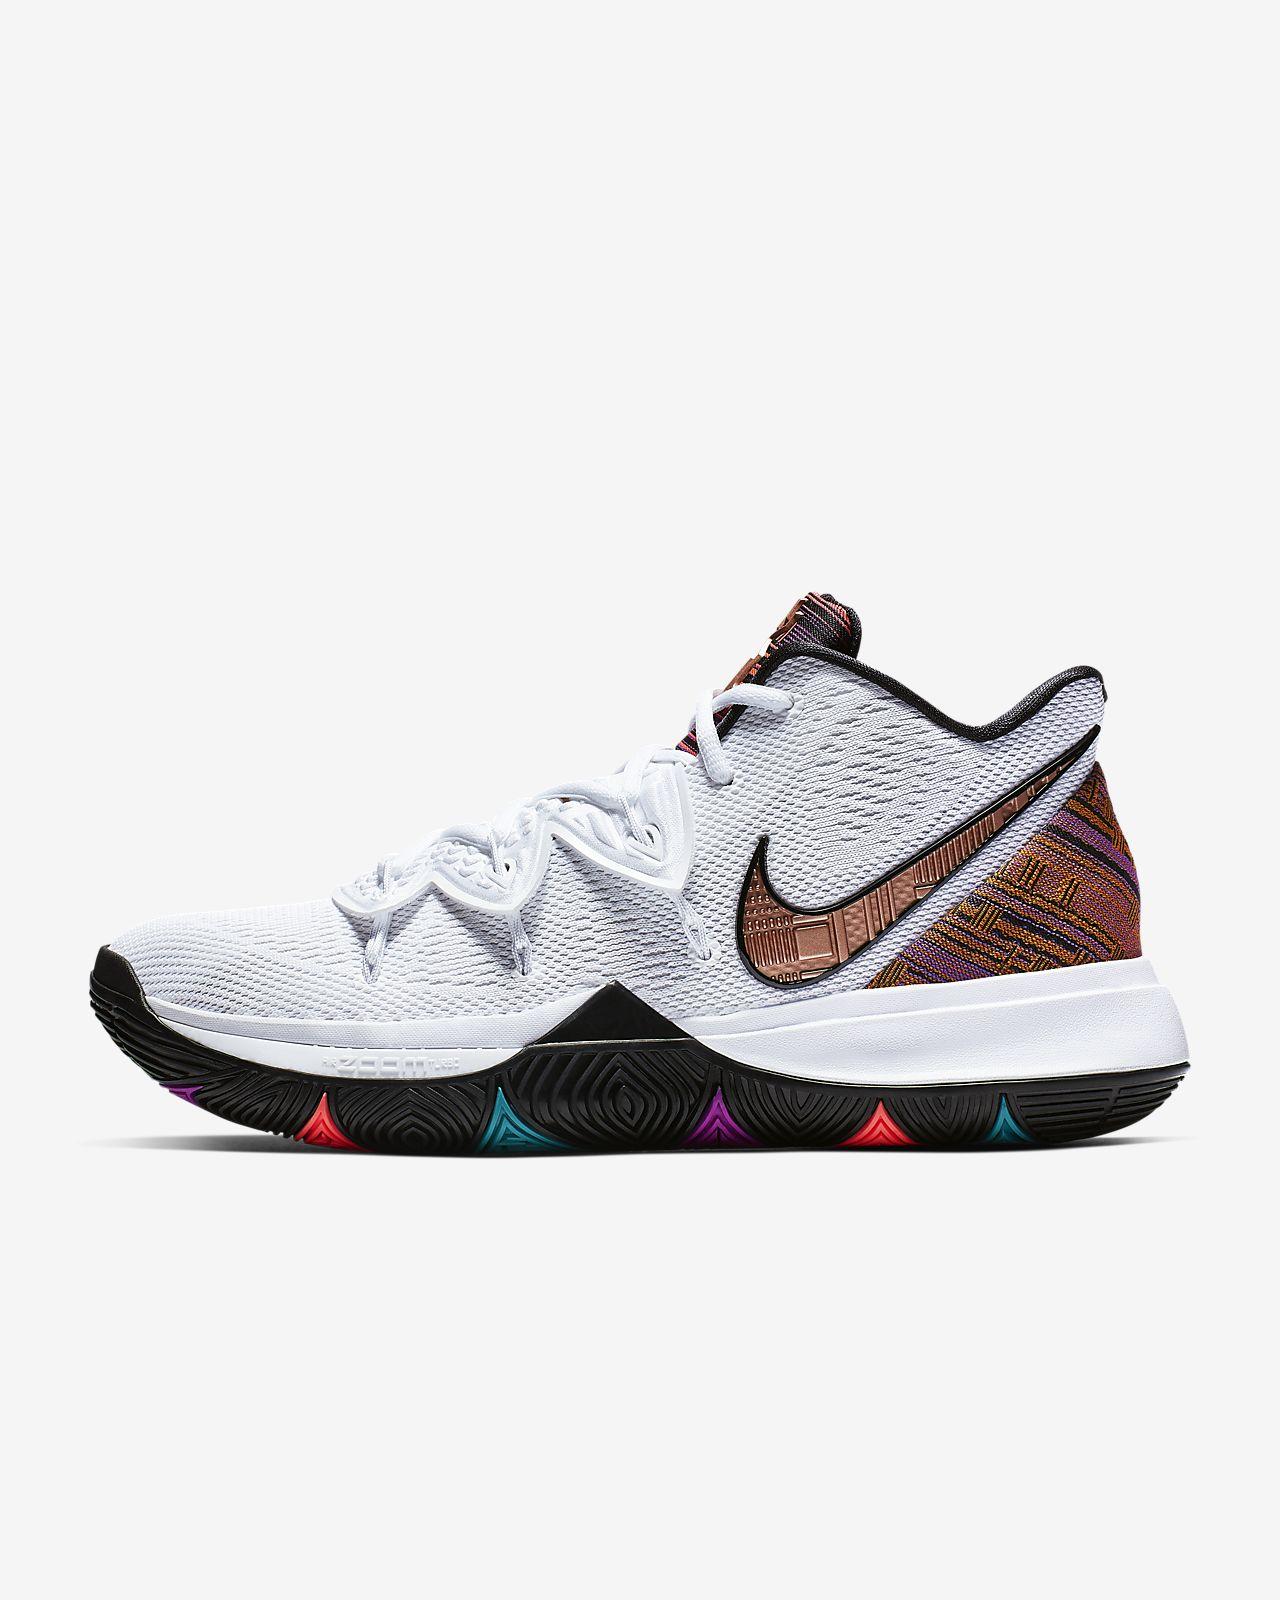 Kyrie 5 BHM Basketballschuh. Nike.com AT 8579fc8eb8